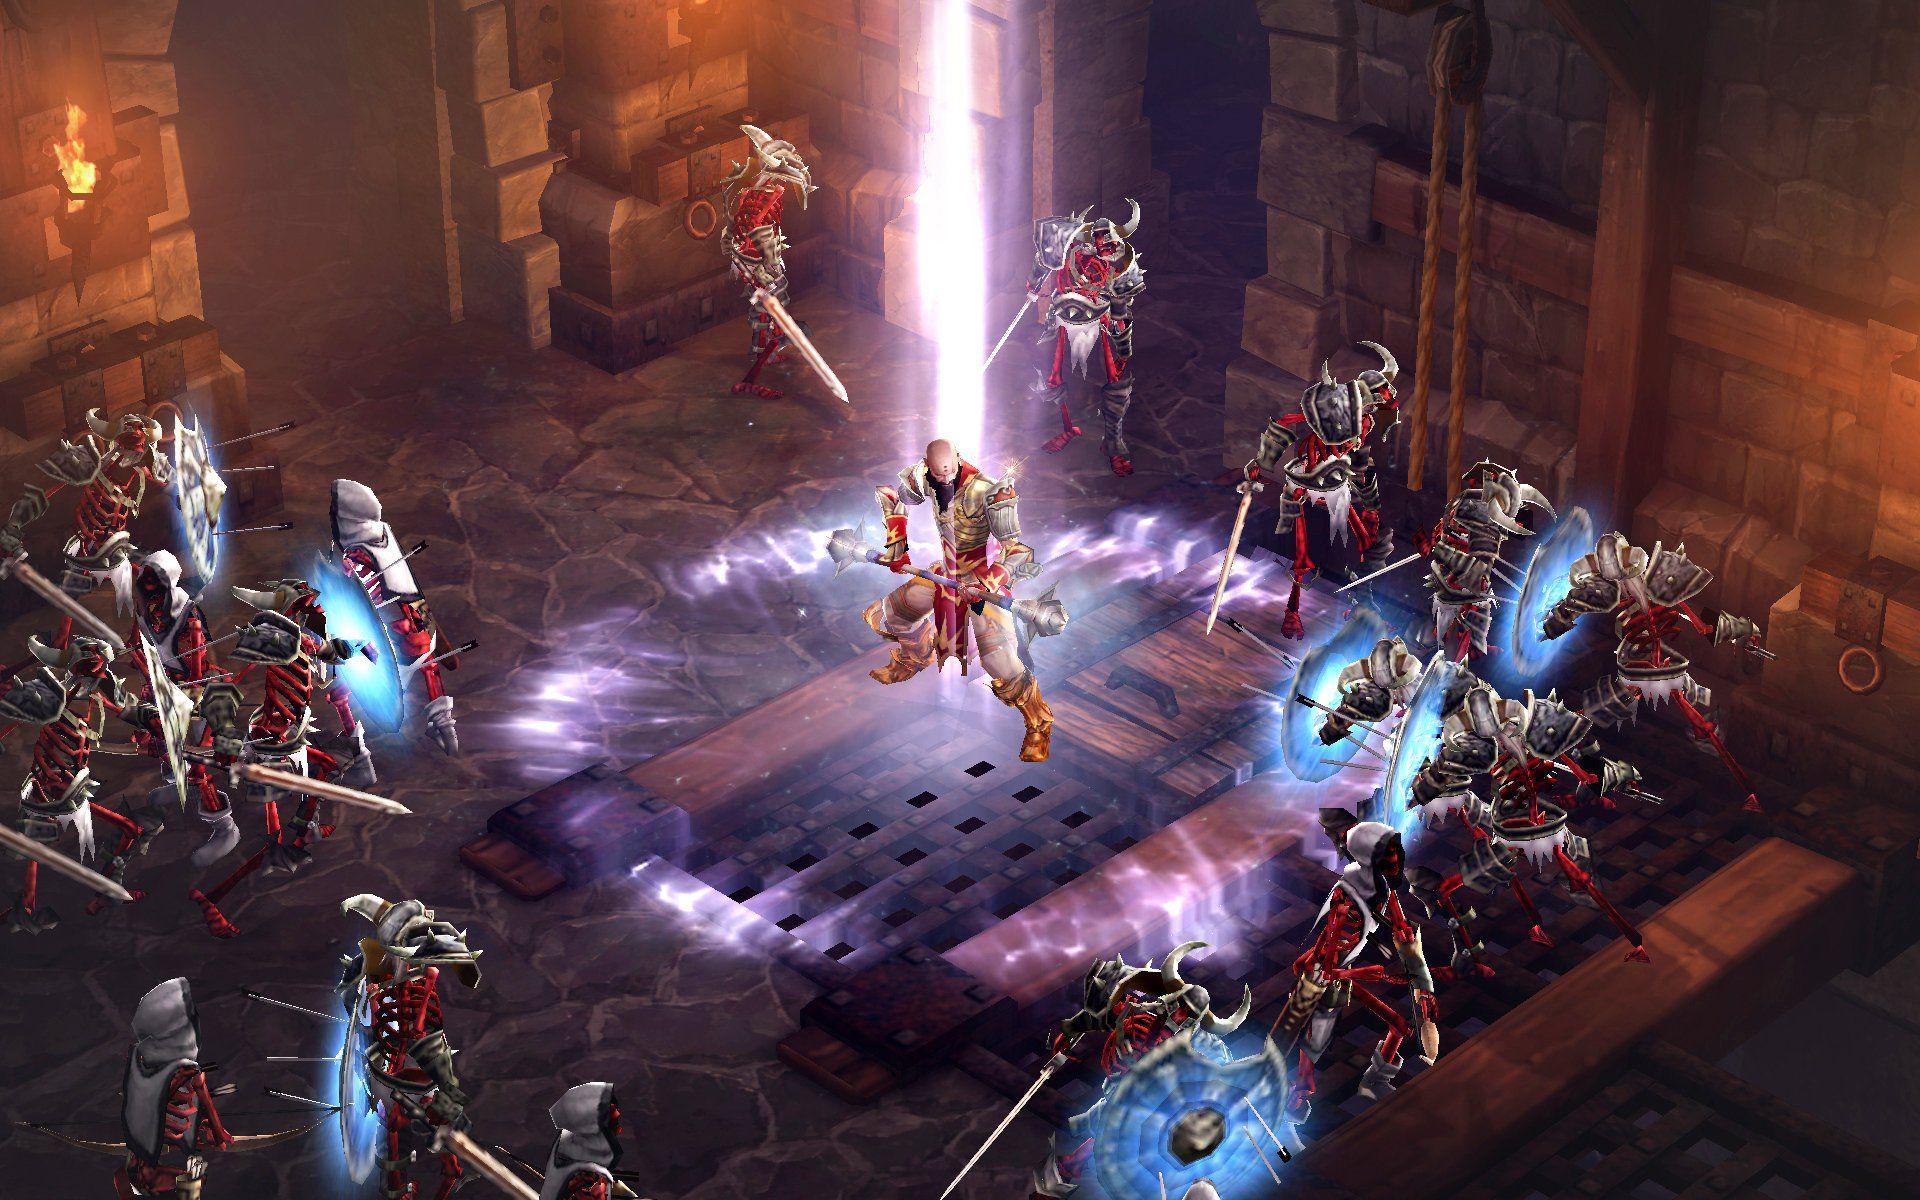 Diablo III: Ultimate Evil Edition,#III, #Diablo, #Ultimate, #Edition | Diablo, Xbox one, Playstation